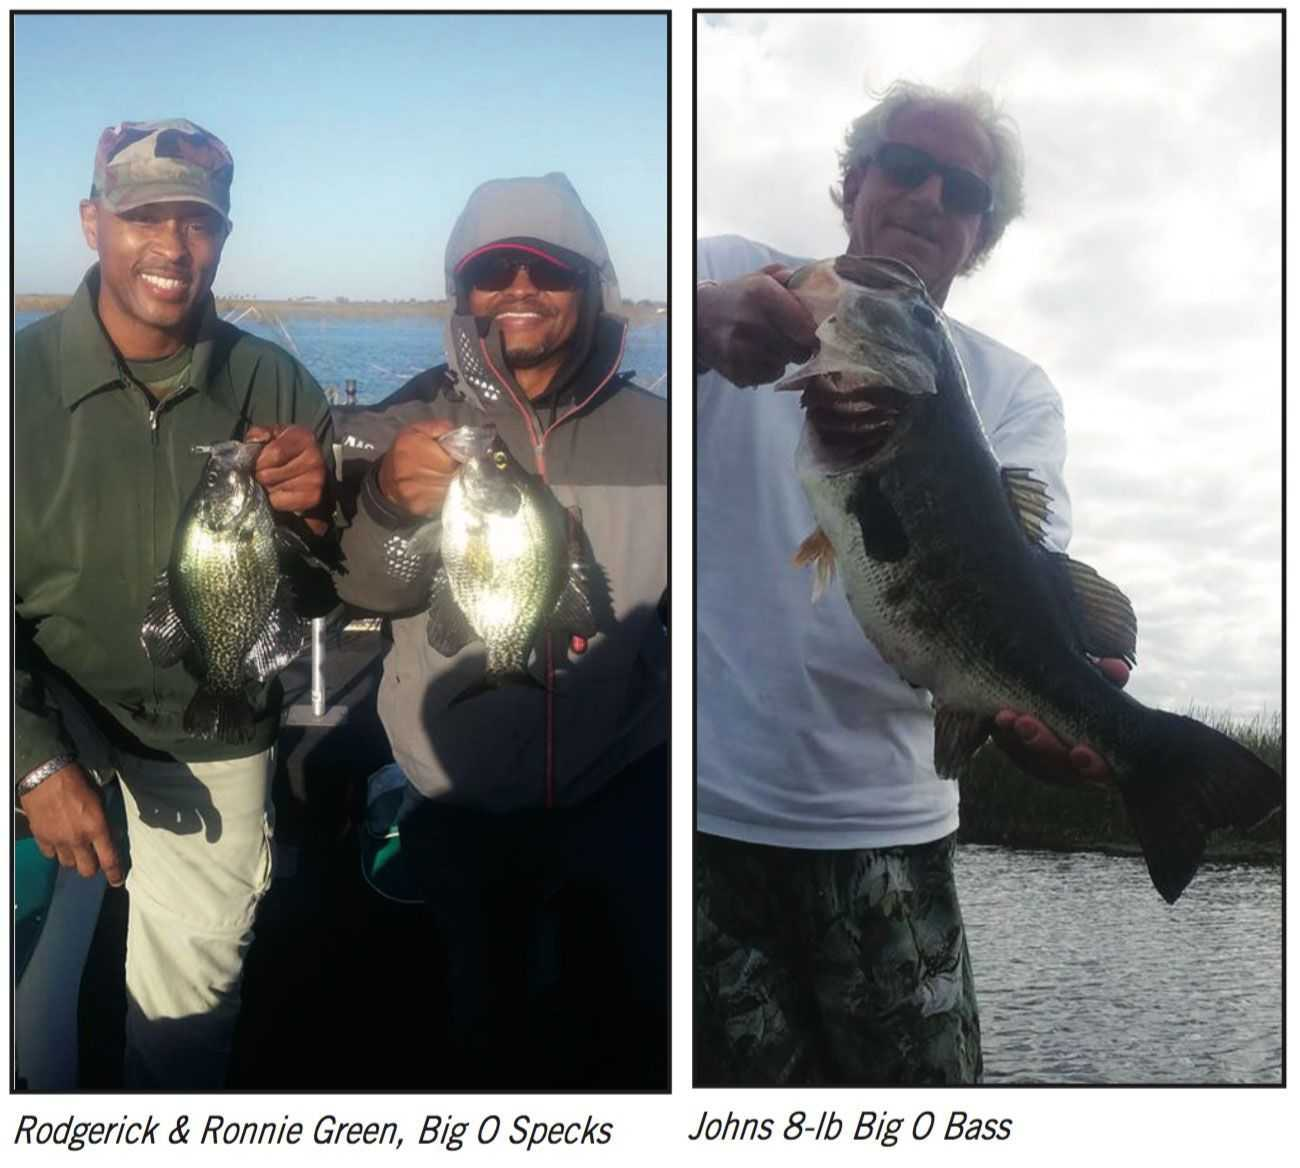 Lake okeechobee north end fishing report april 2016 for Lake okeechobee fishing